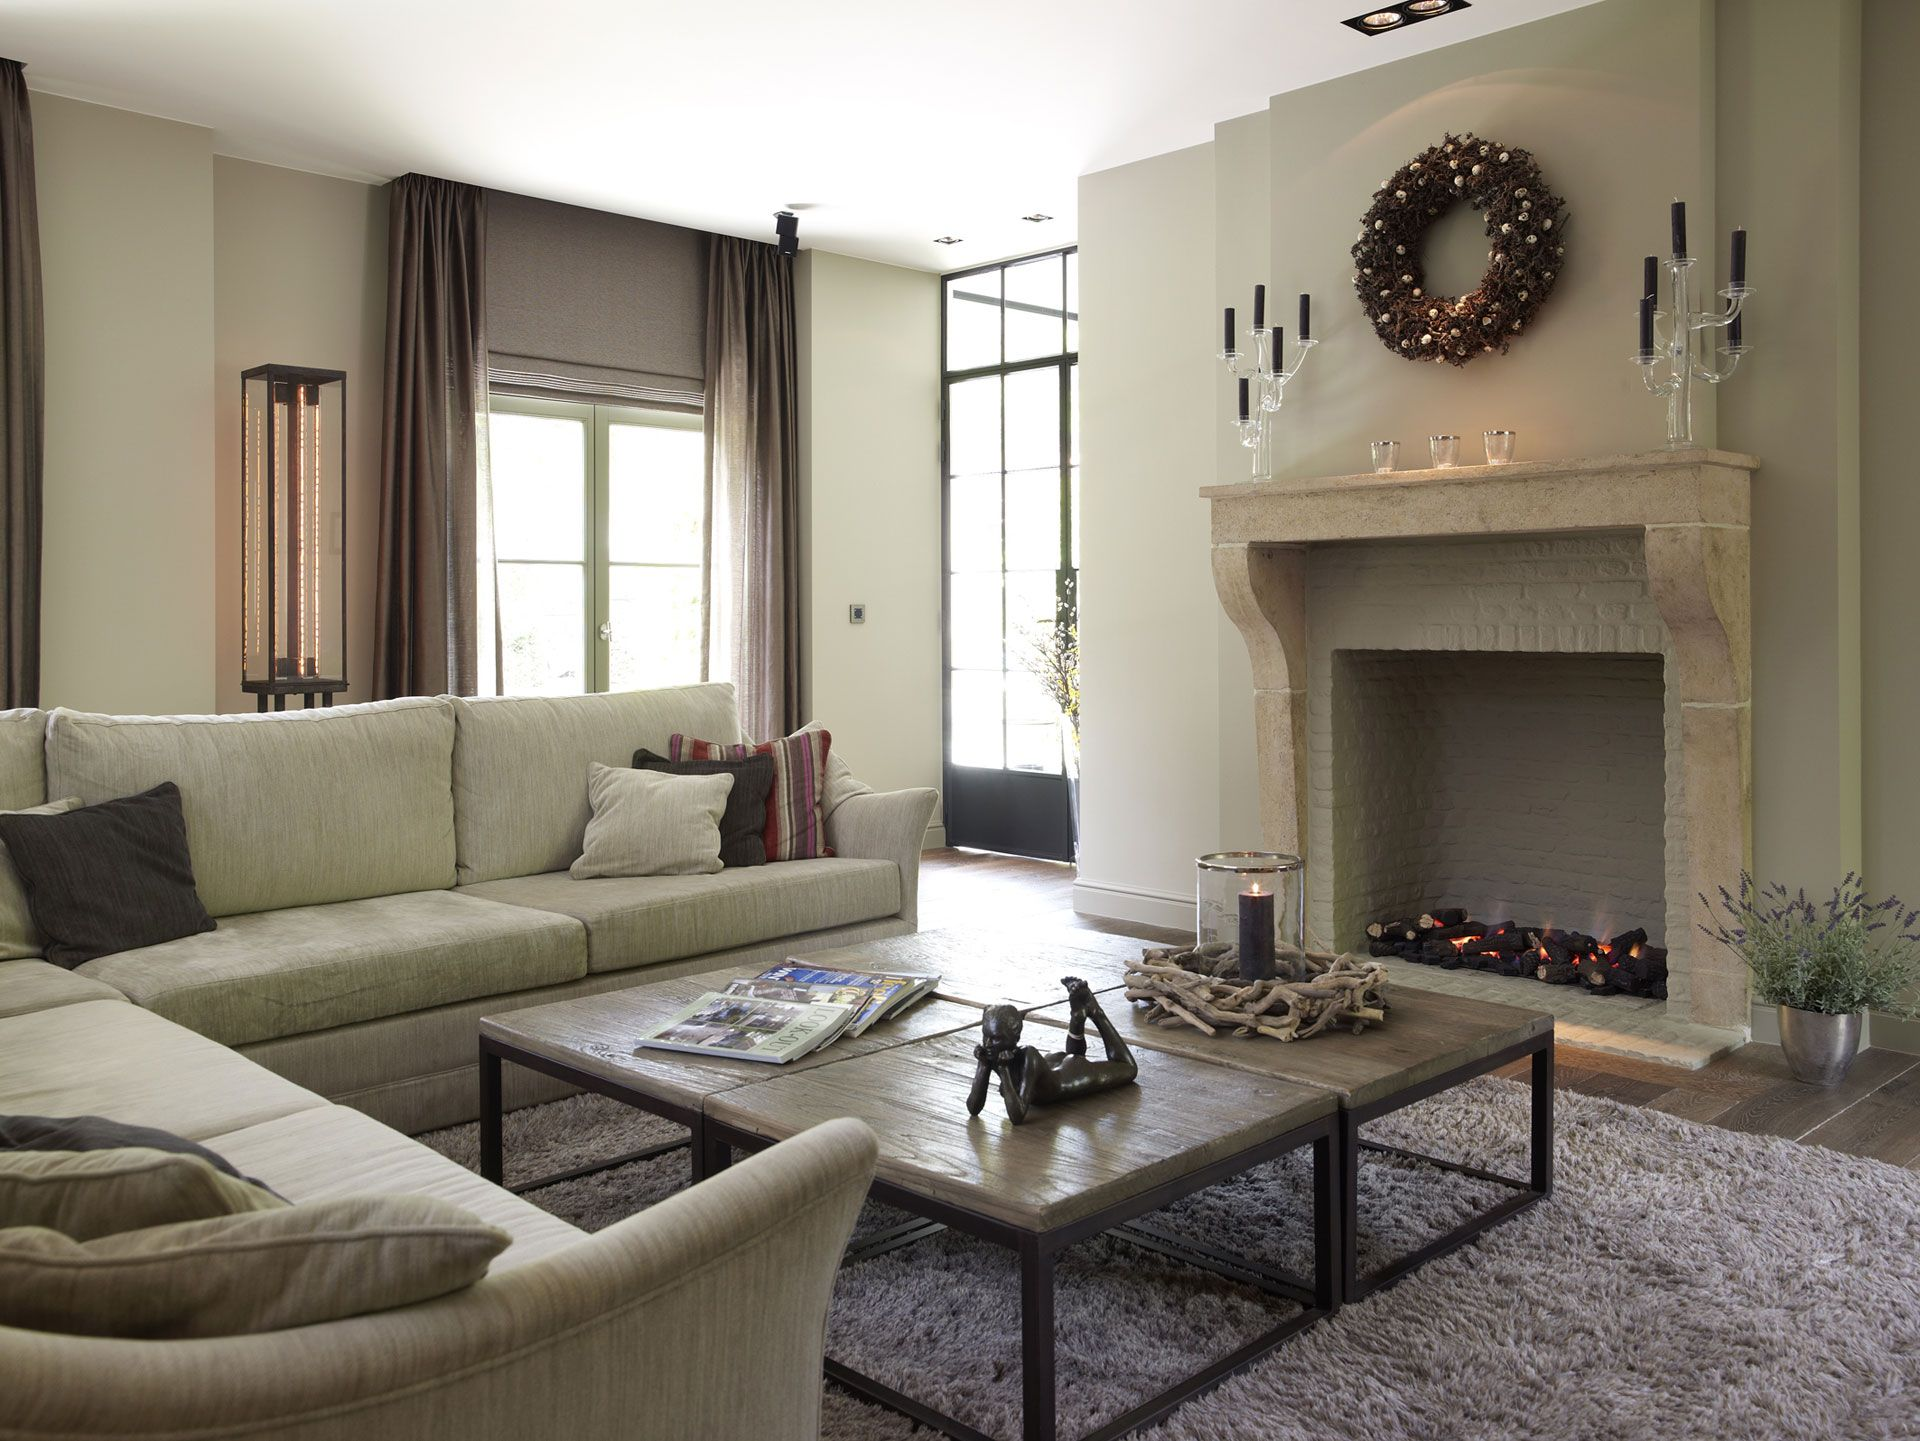 Fire Place Belgian Styleluxury Living Roomsfireplace